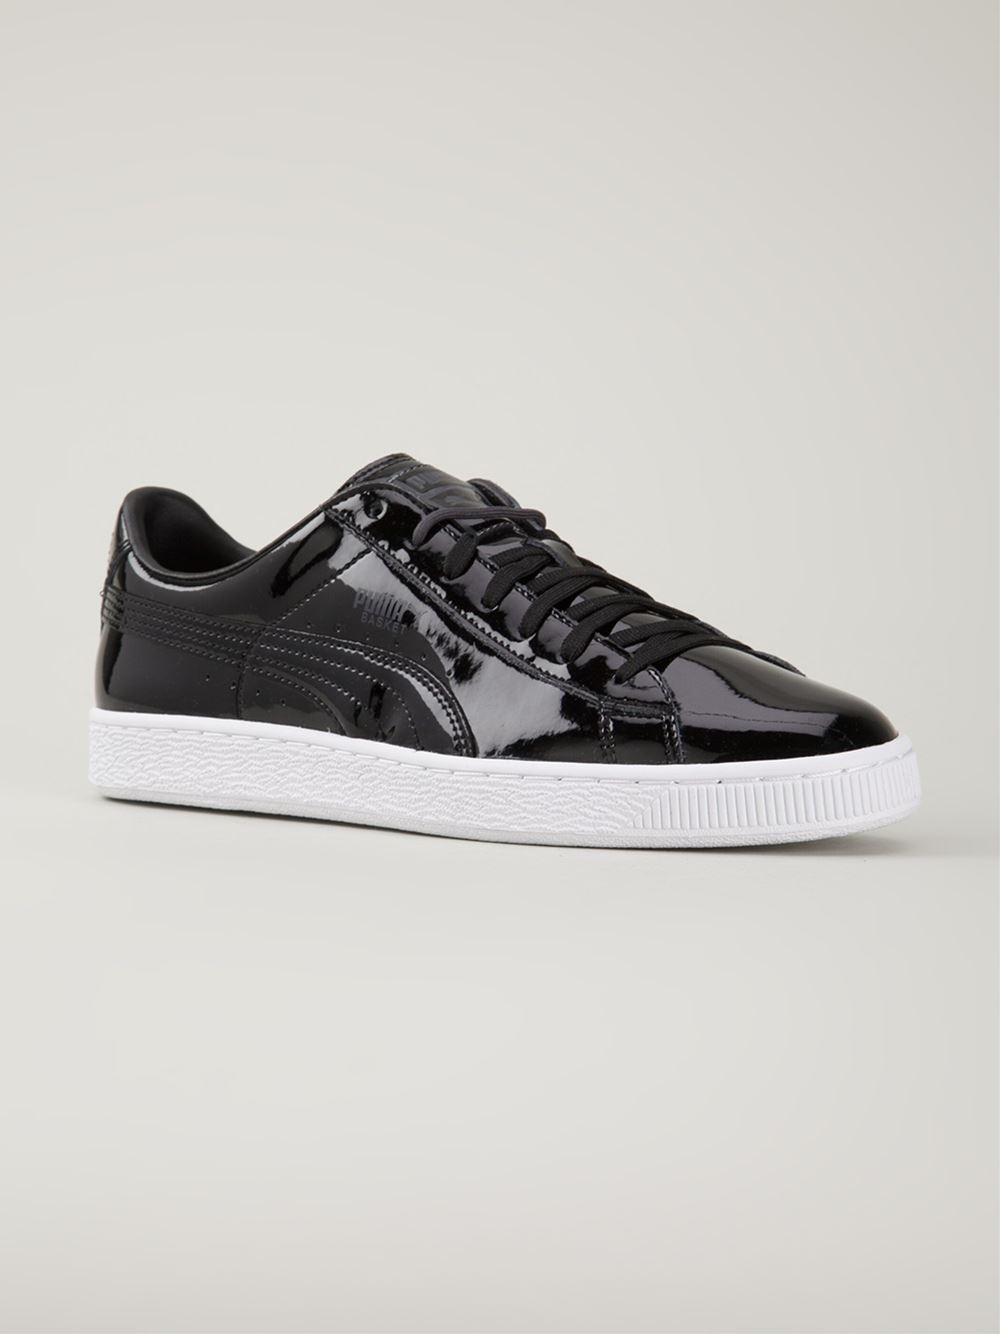 5fbcaef7c9098b Lyst - PUMA  Basket Classic Patent  Sneakers in Black for Men